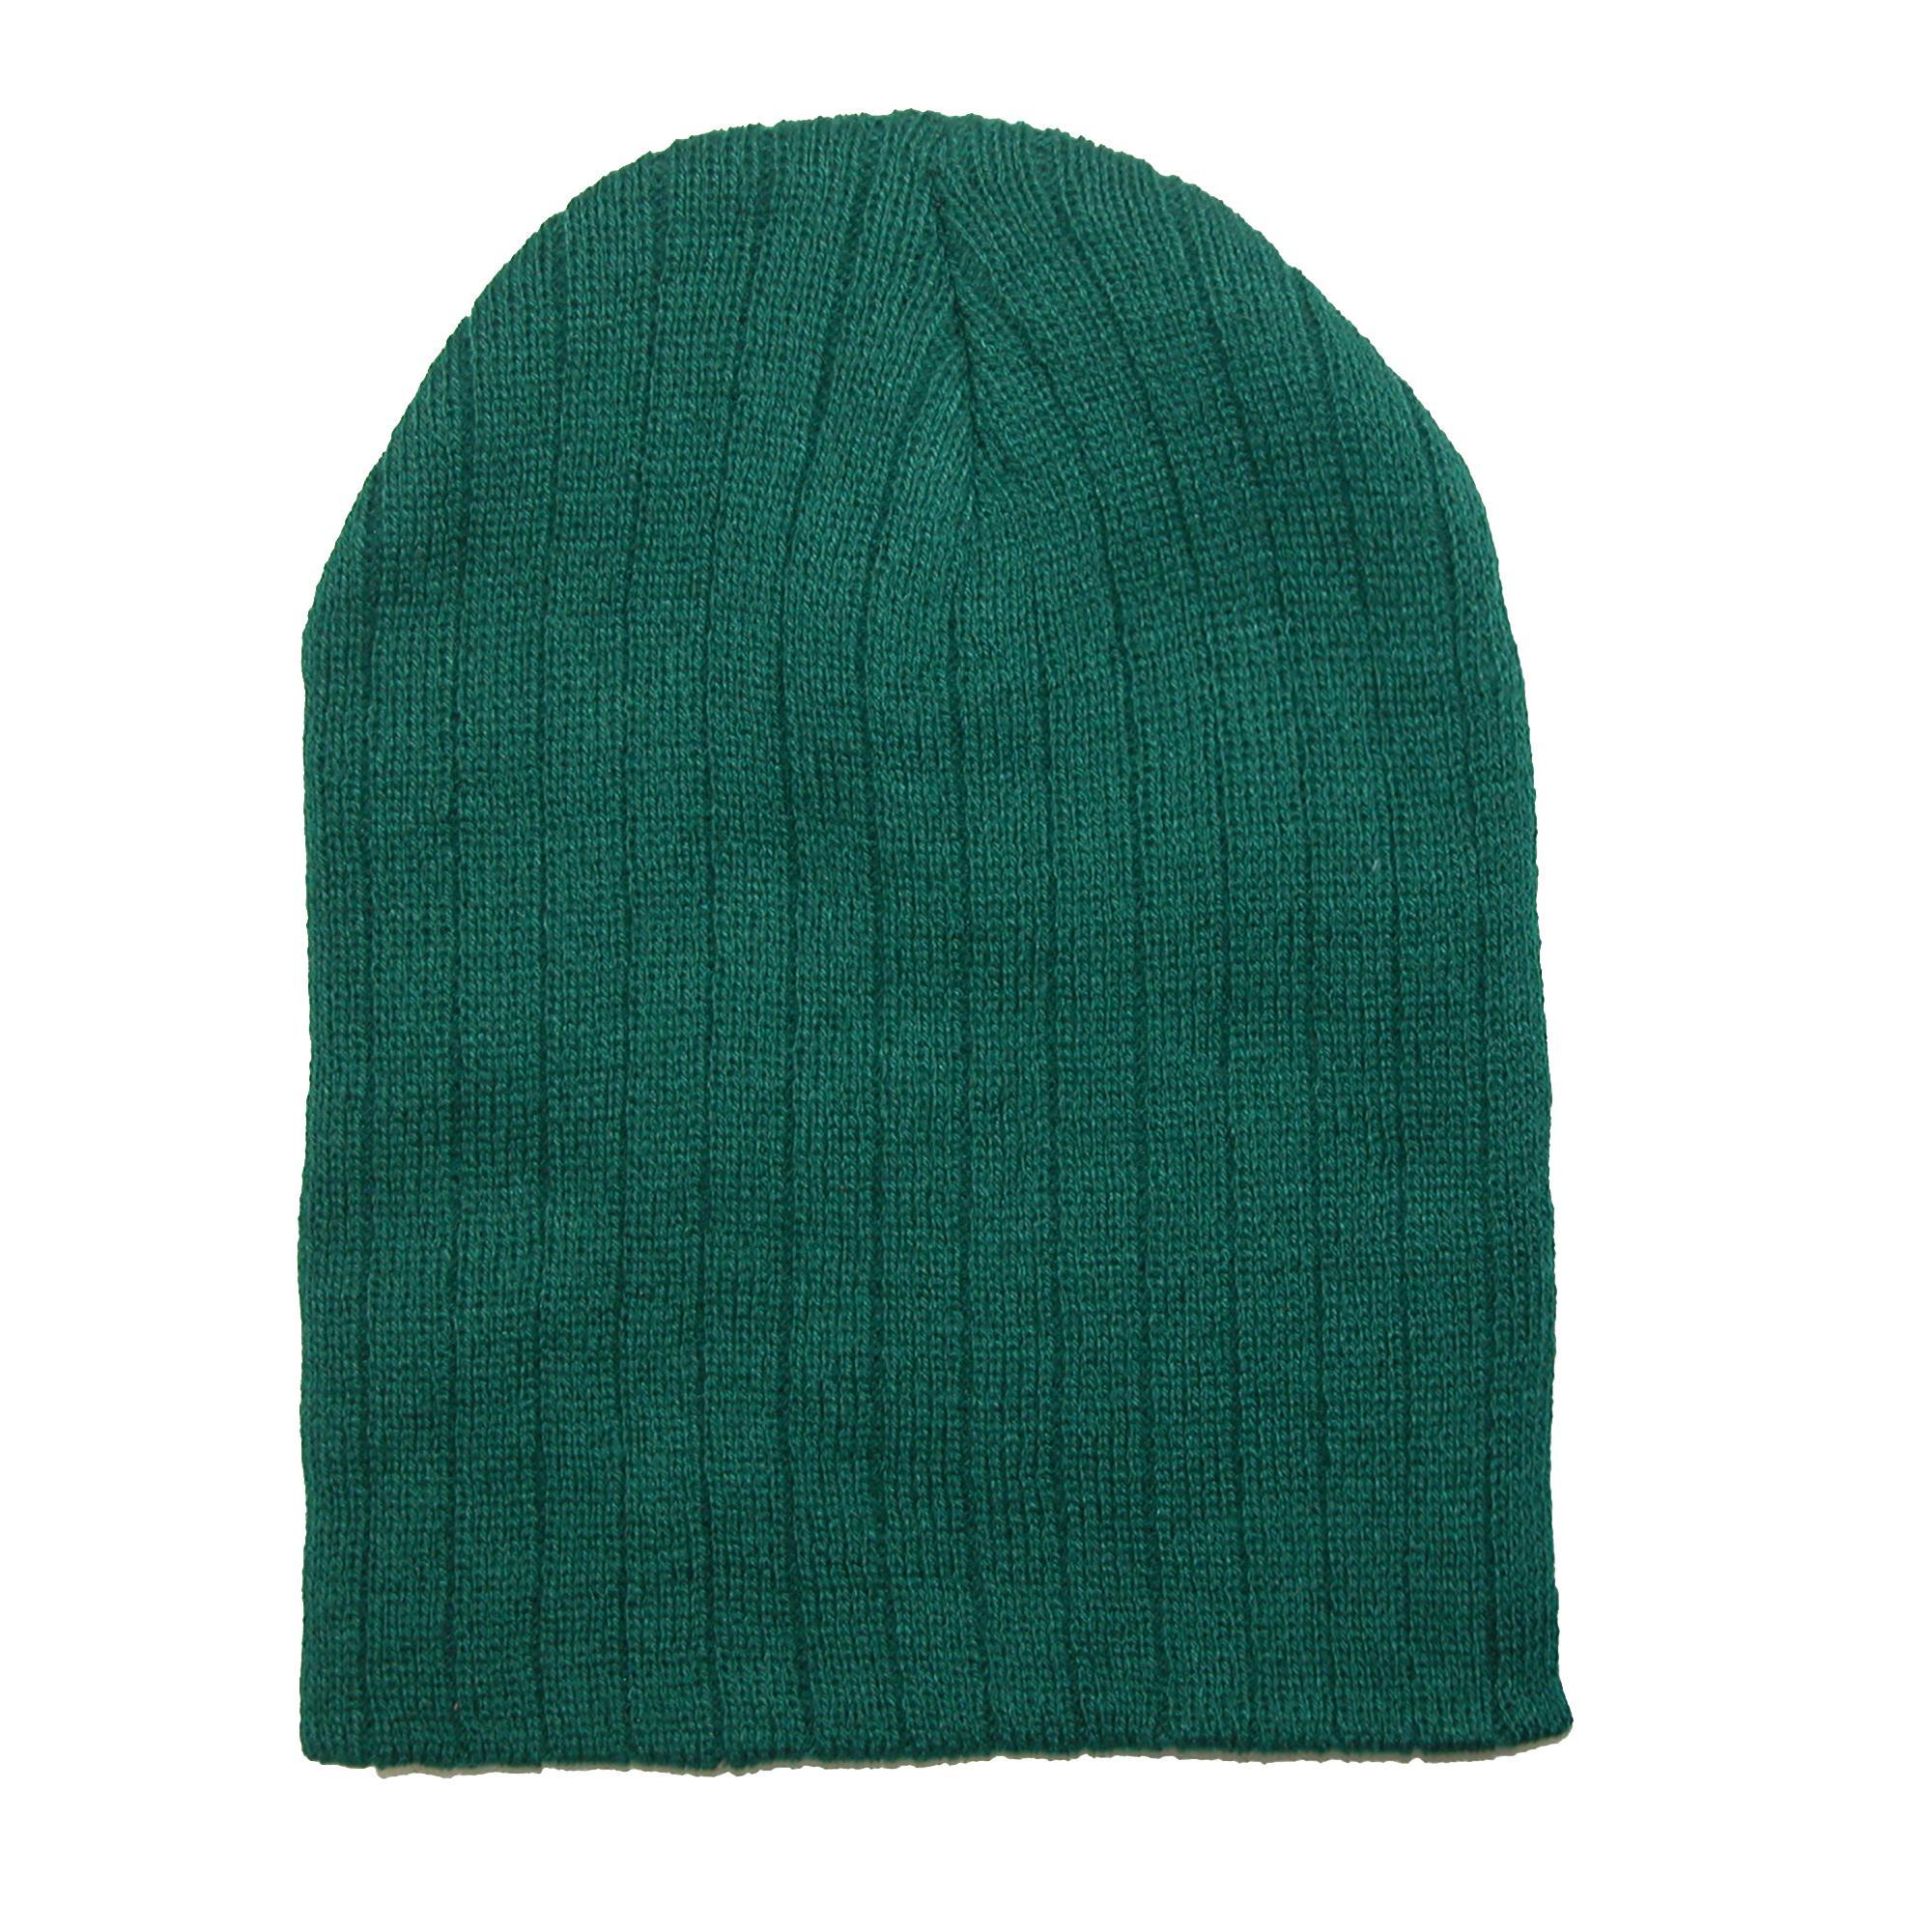 Winter Stocking Cap 13